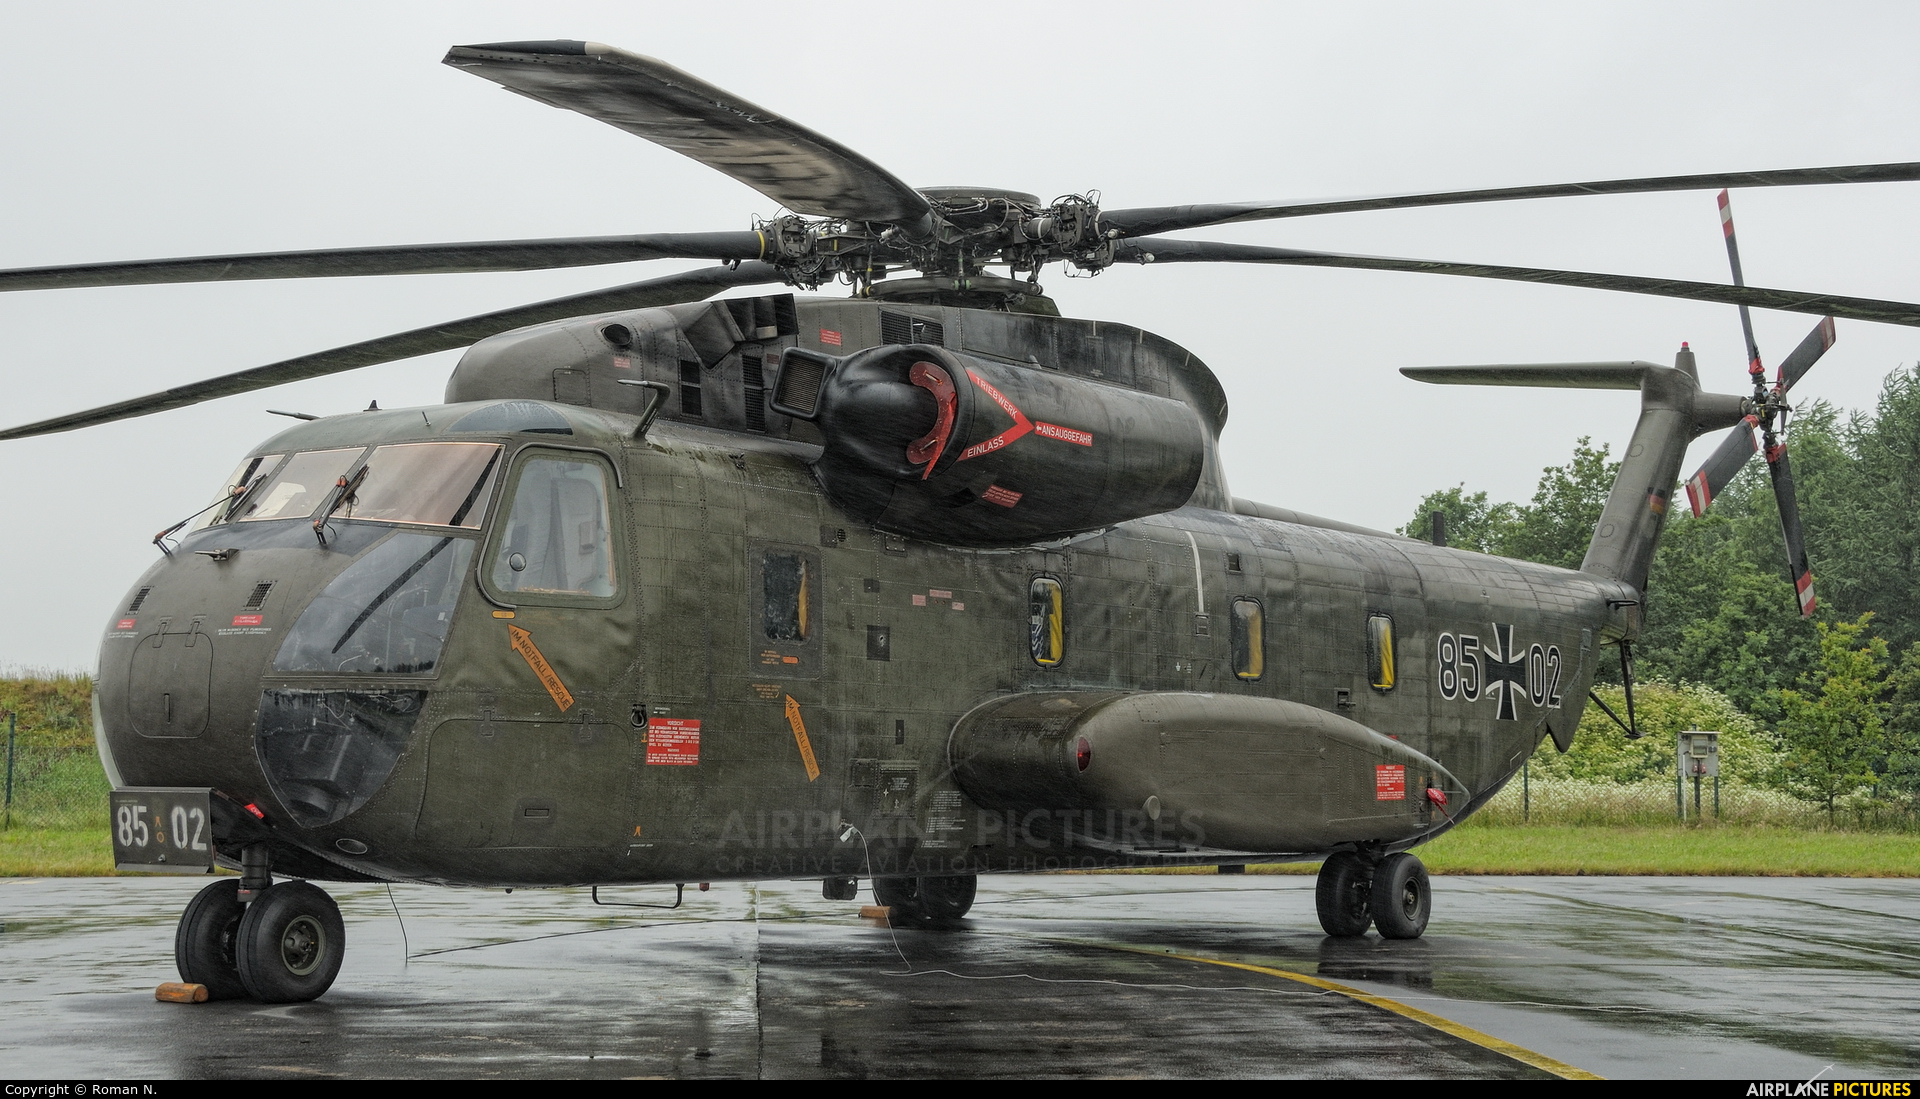 Germany - Air Force 85+02 aircraft at Wittmundhafen